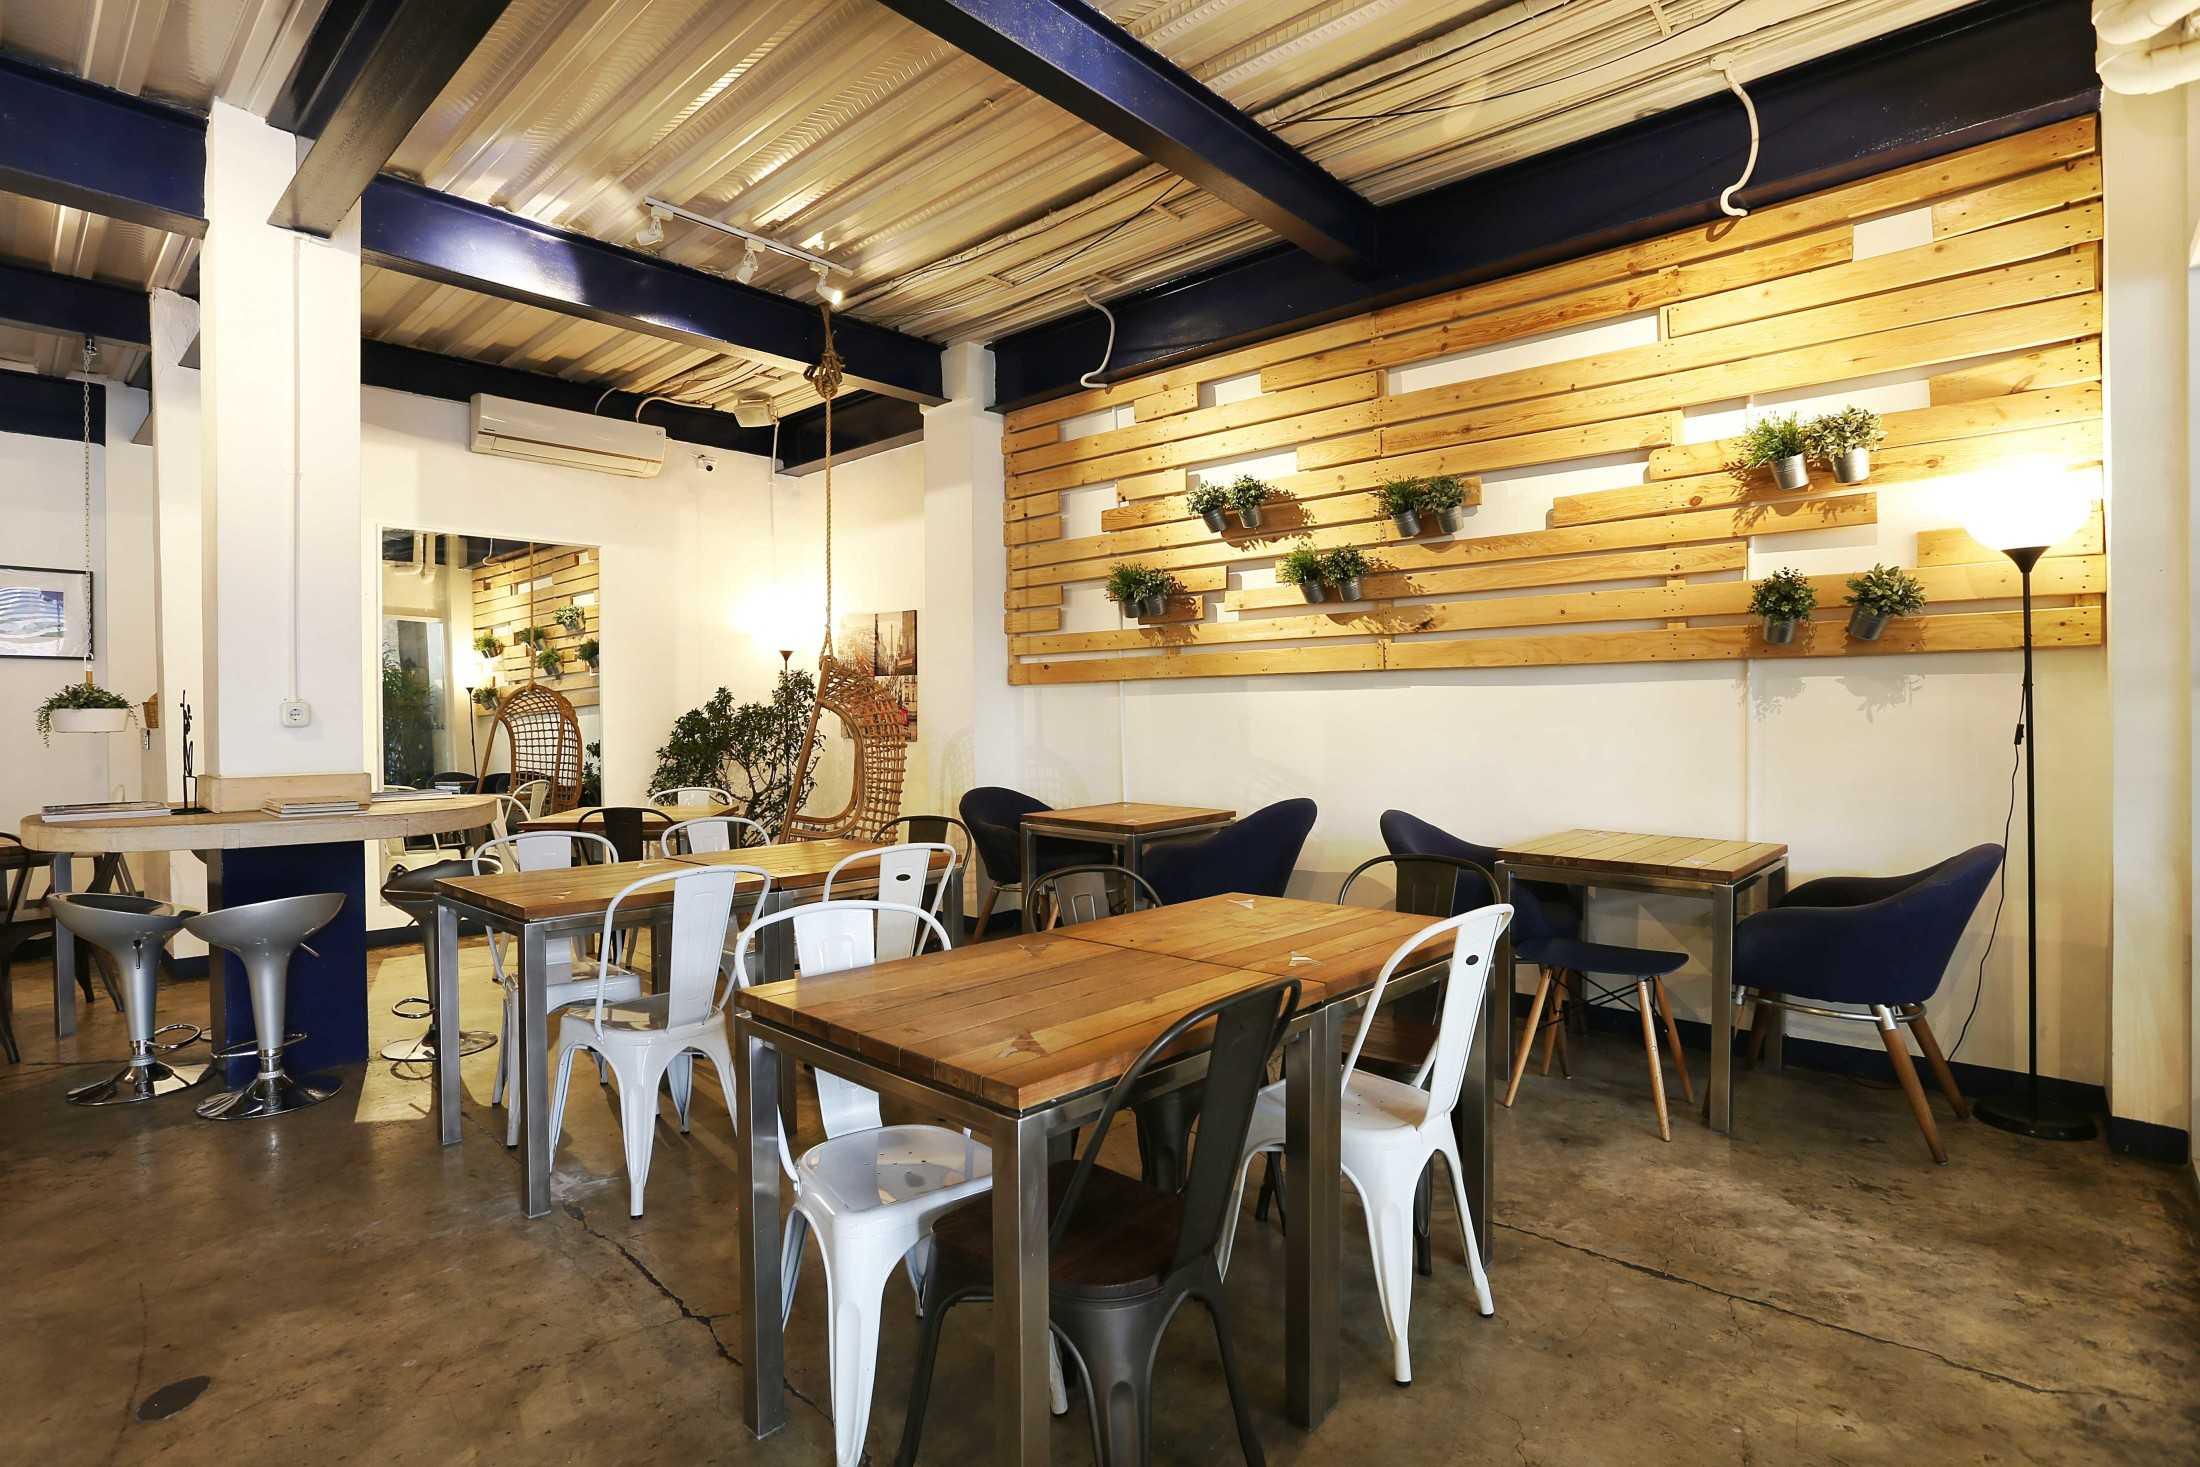 Jasa Interior Desainer Home by Fabelio.com di Garut